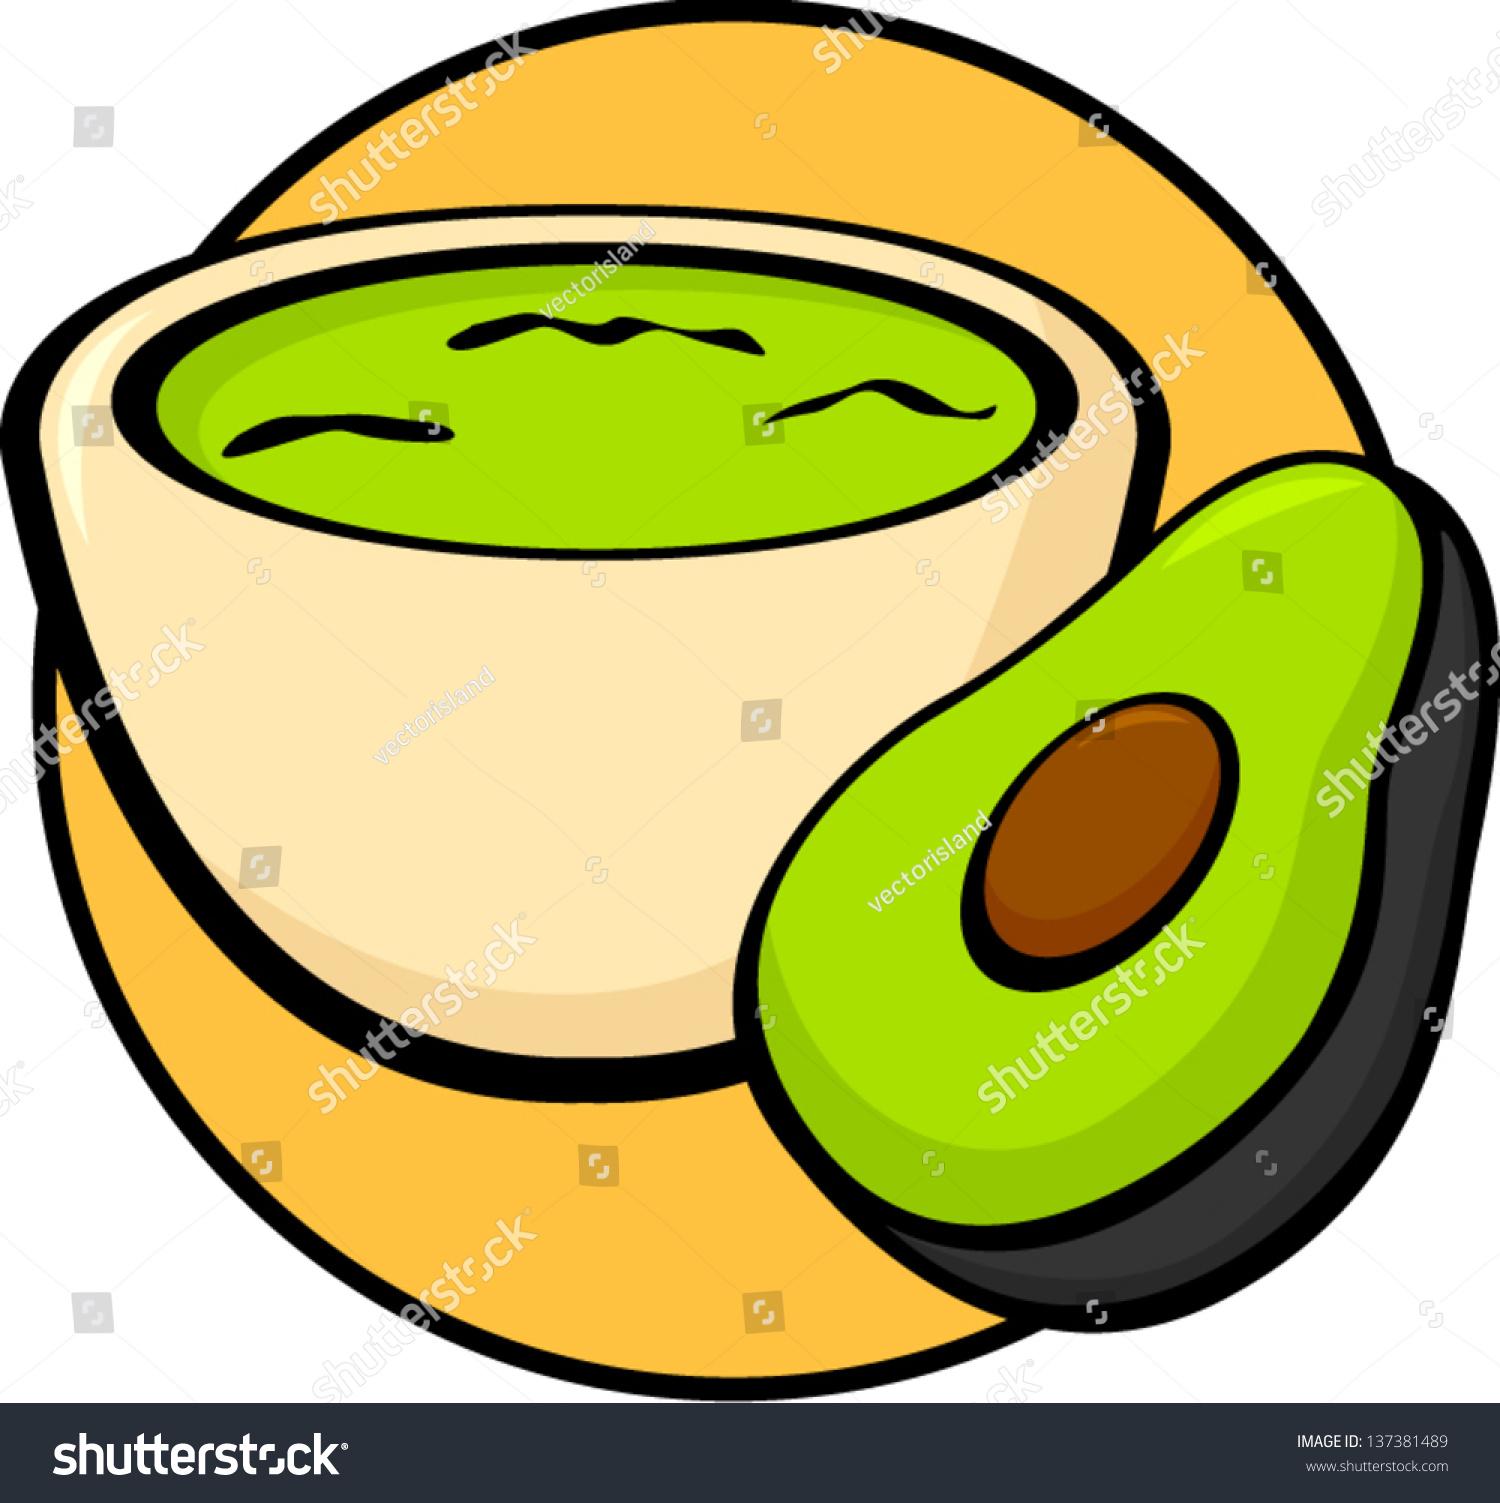 Guacamole Clipart guacamole dip stock vectors & vector clip art ...